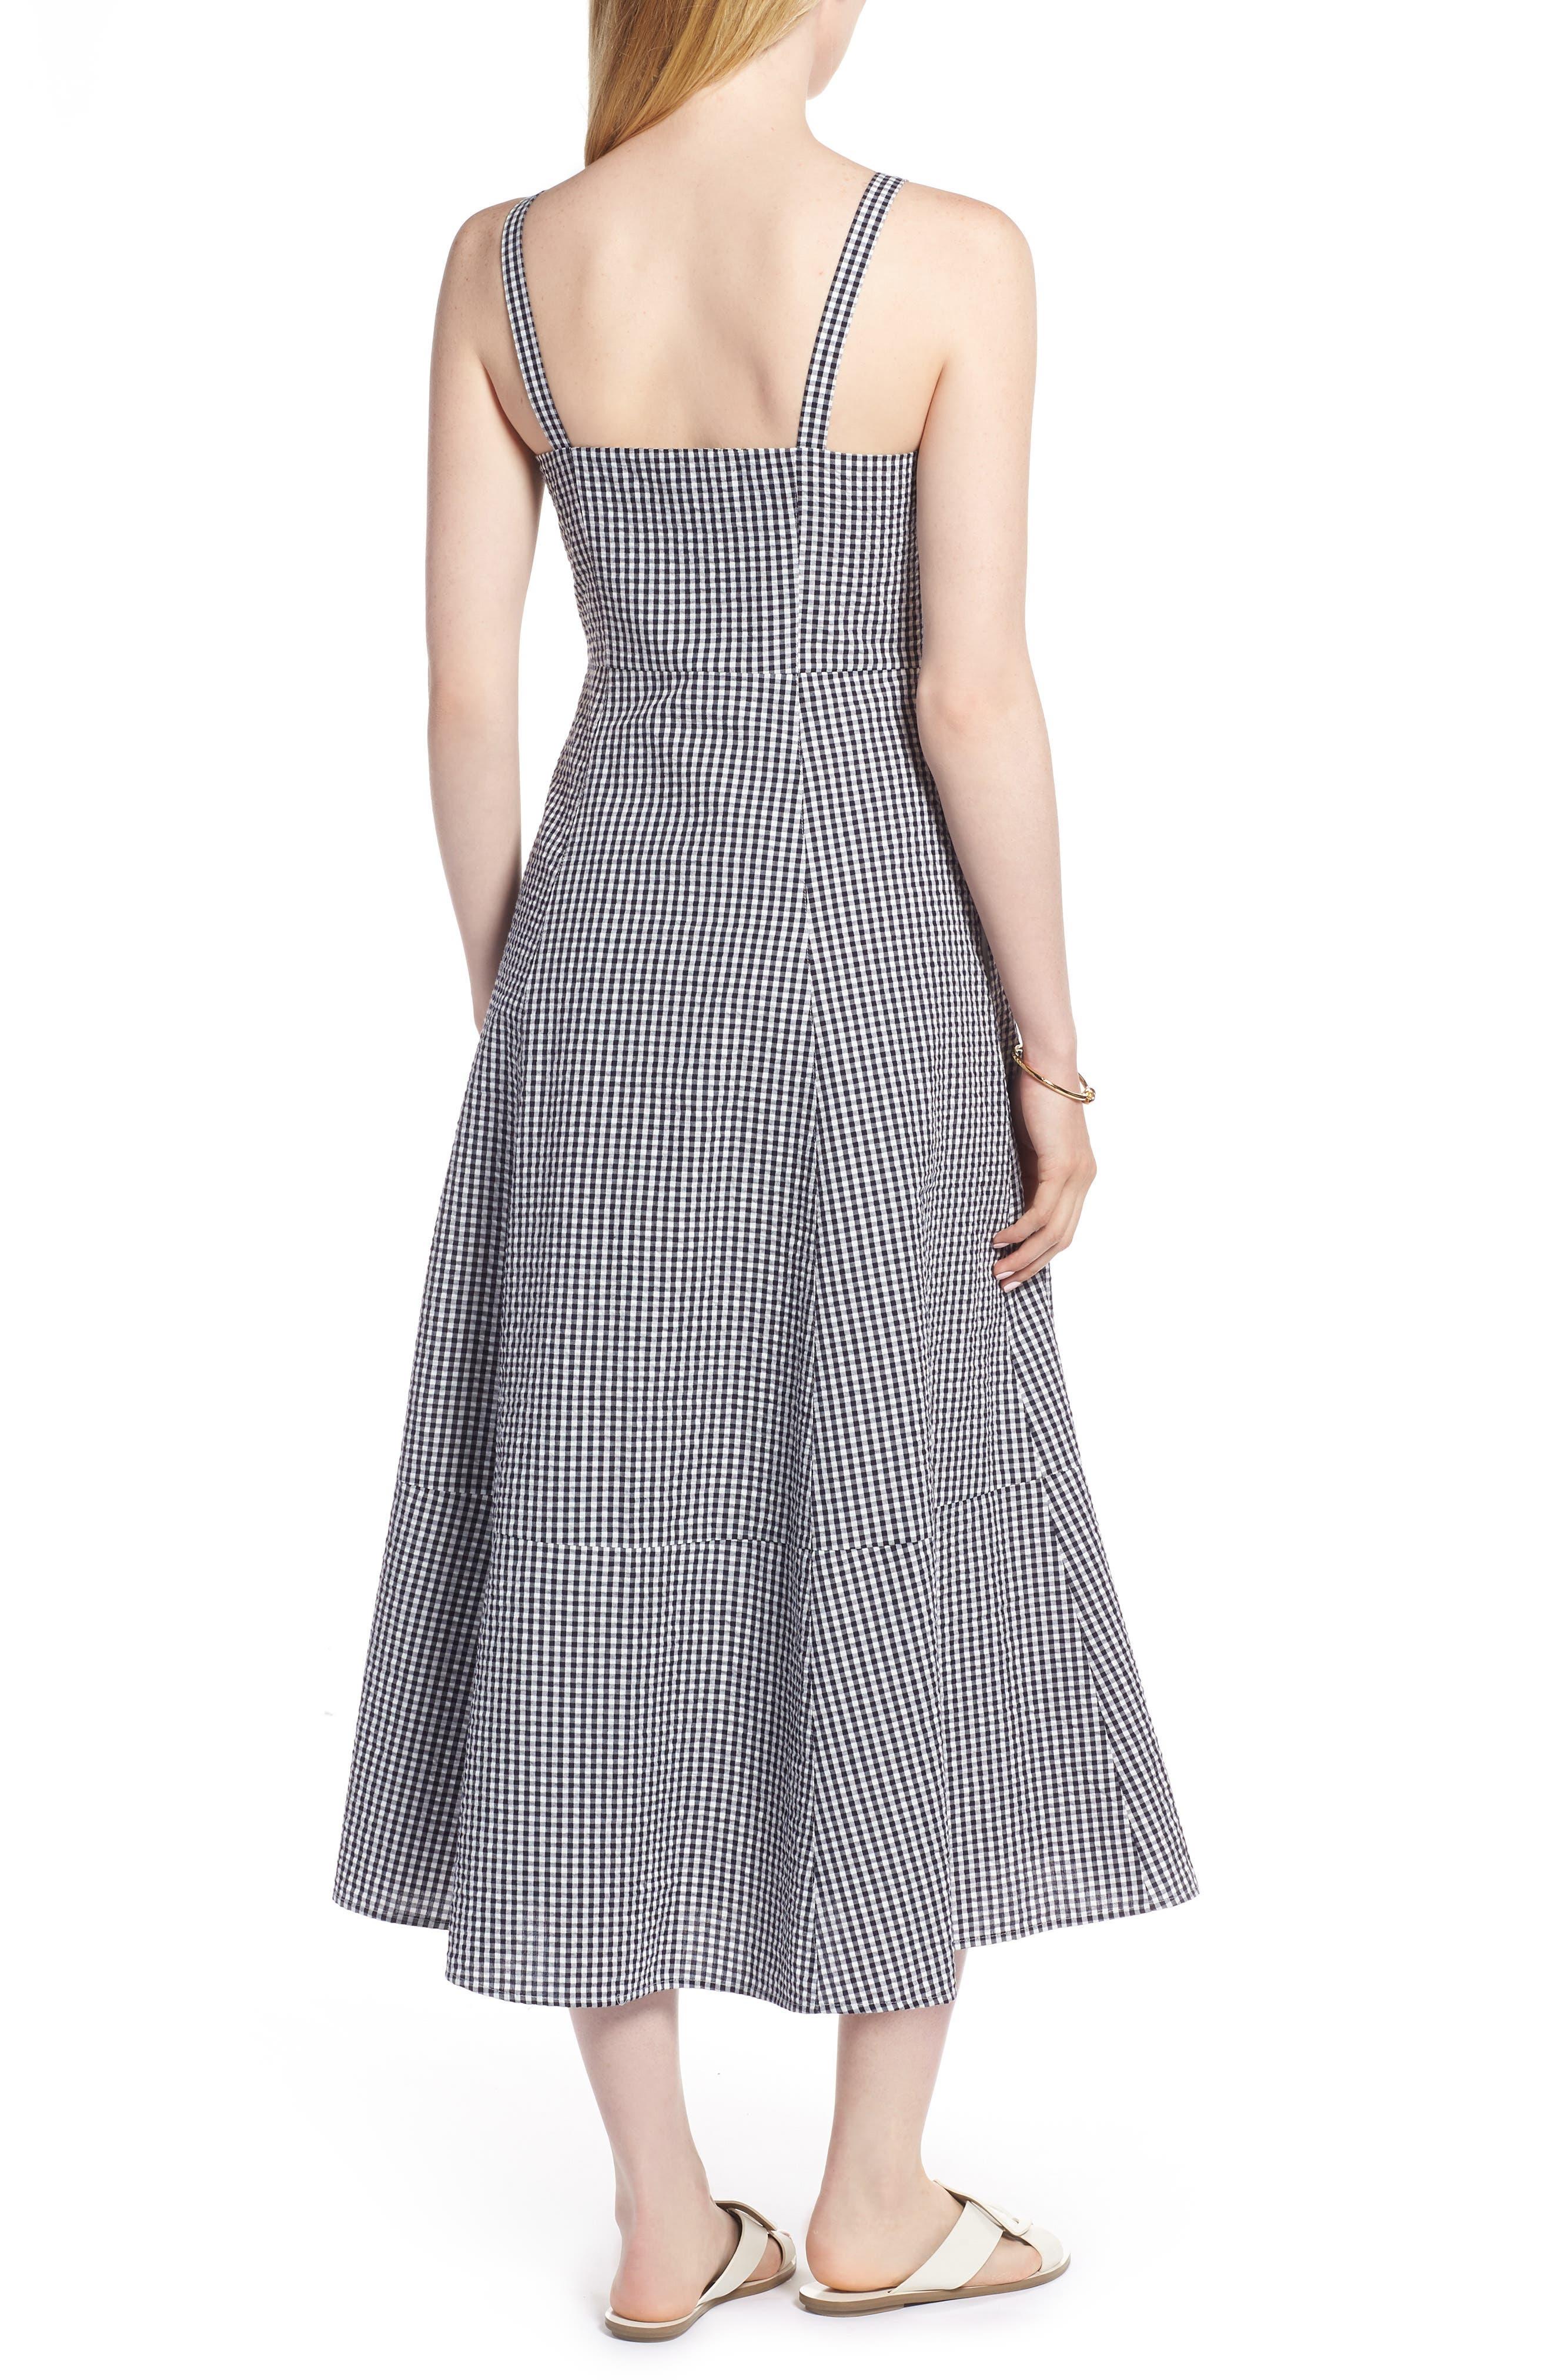 Gingham Button Front Cotton Blend Dress,                             Alternate thumbnail 2, color,                             Navy- White Gingham